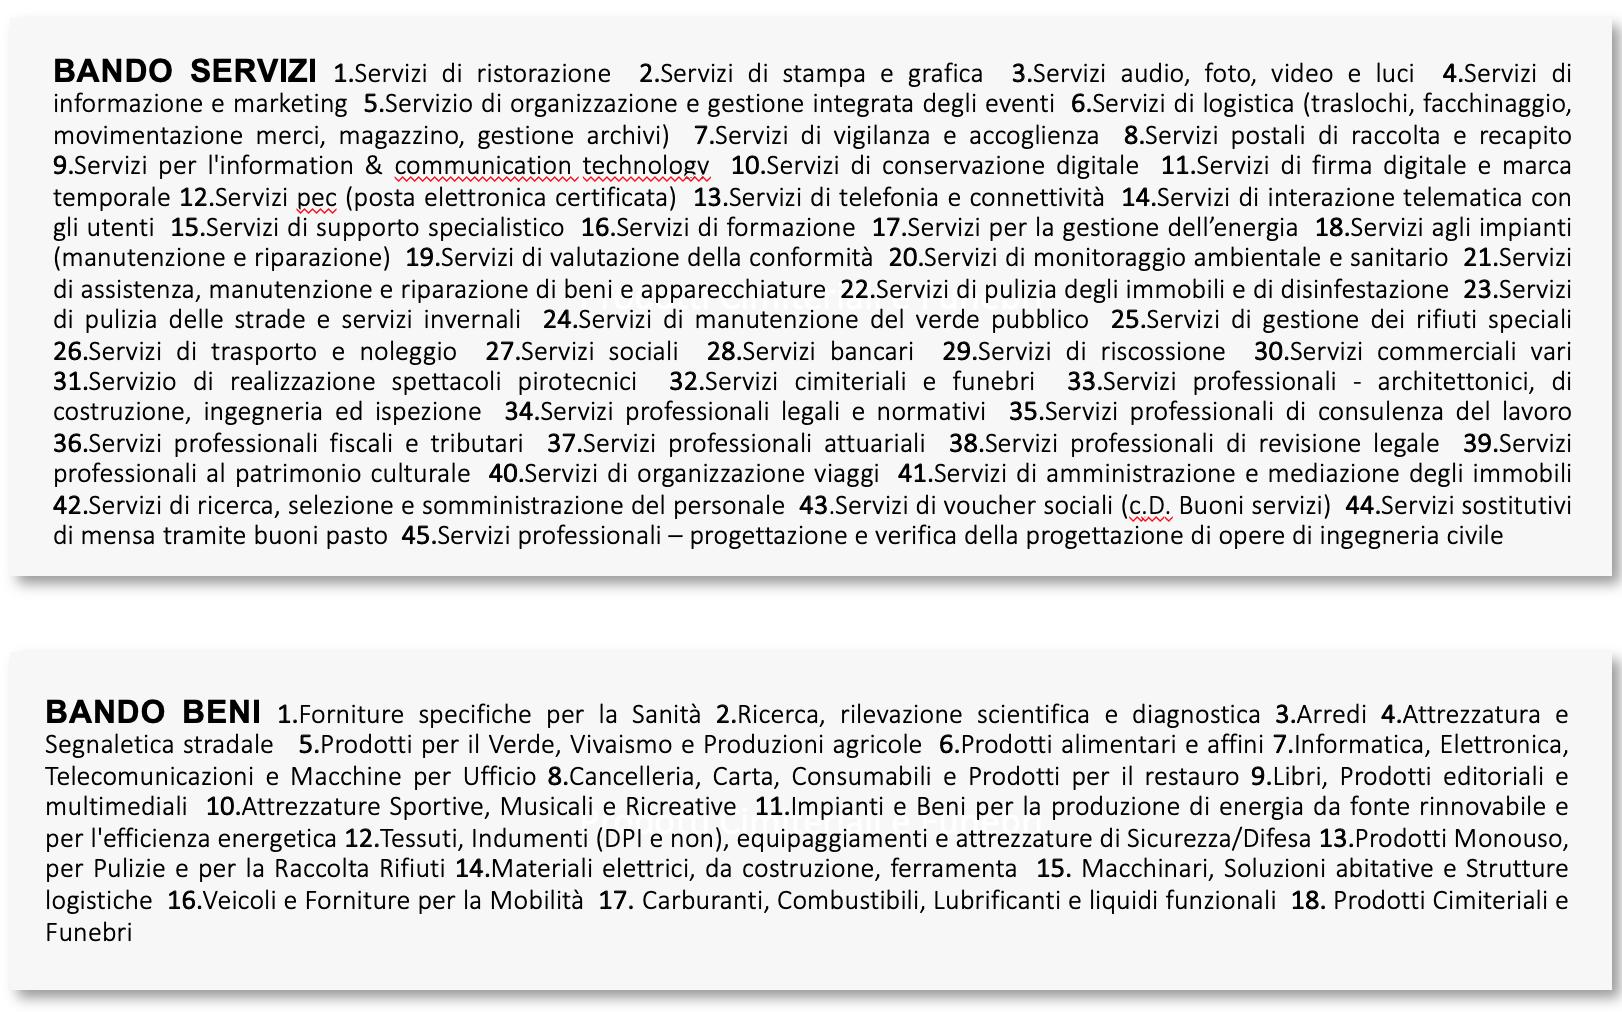 MEPA Bandi - Categorie Merceologiche